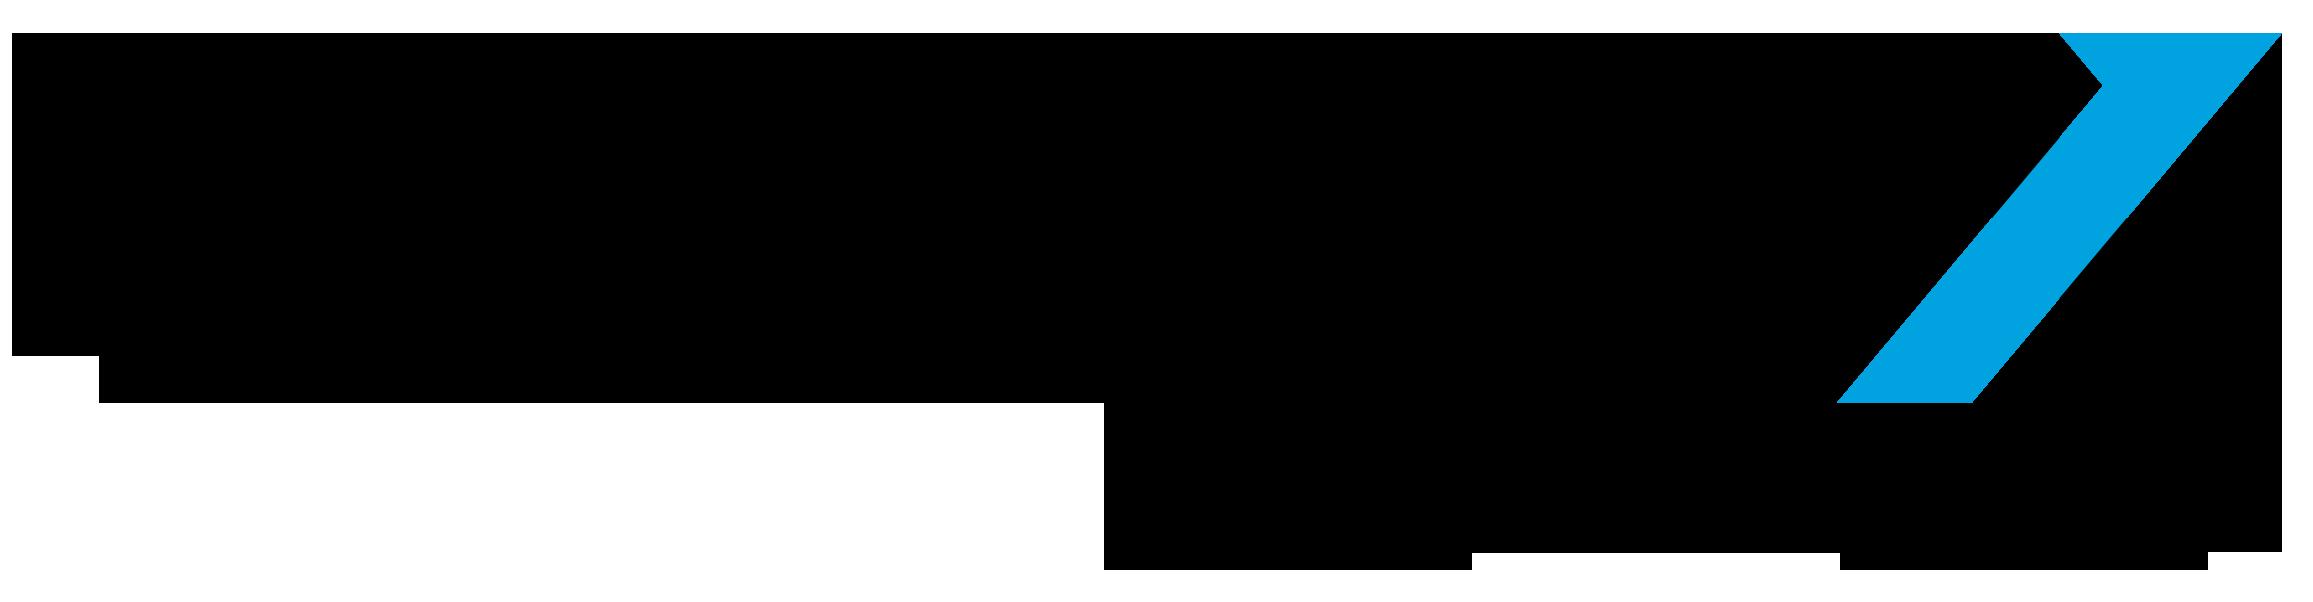 ThreadX-Logo-Black-RGB 2.png